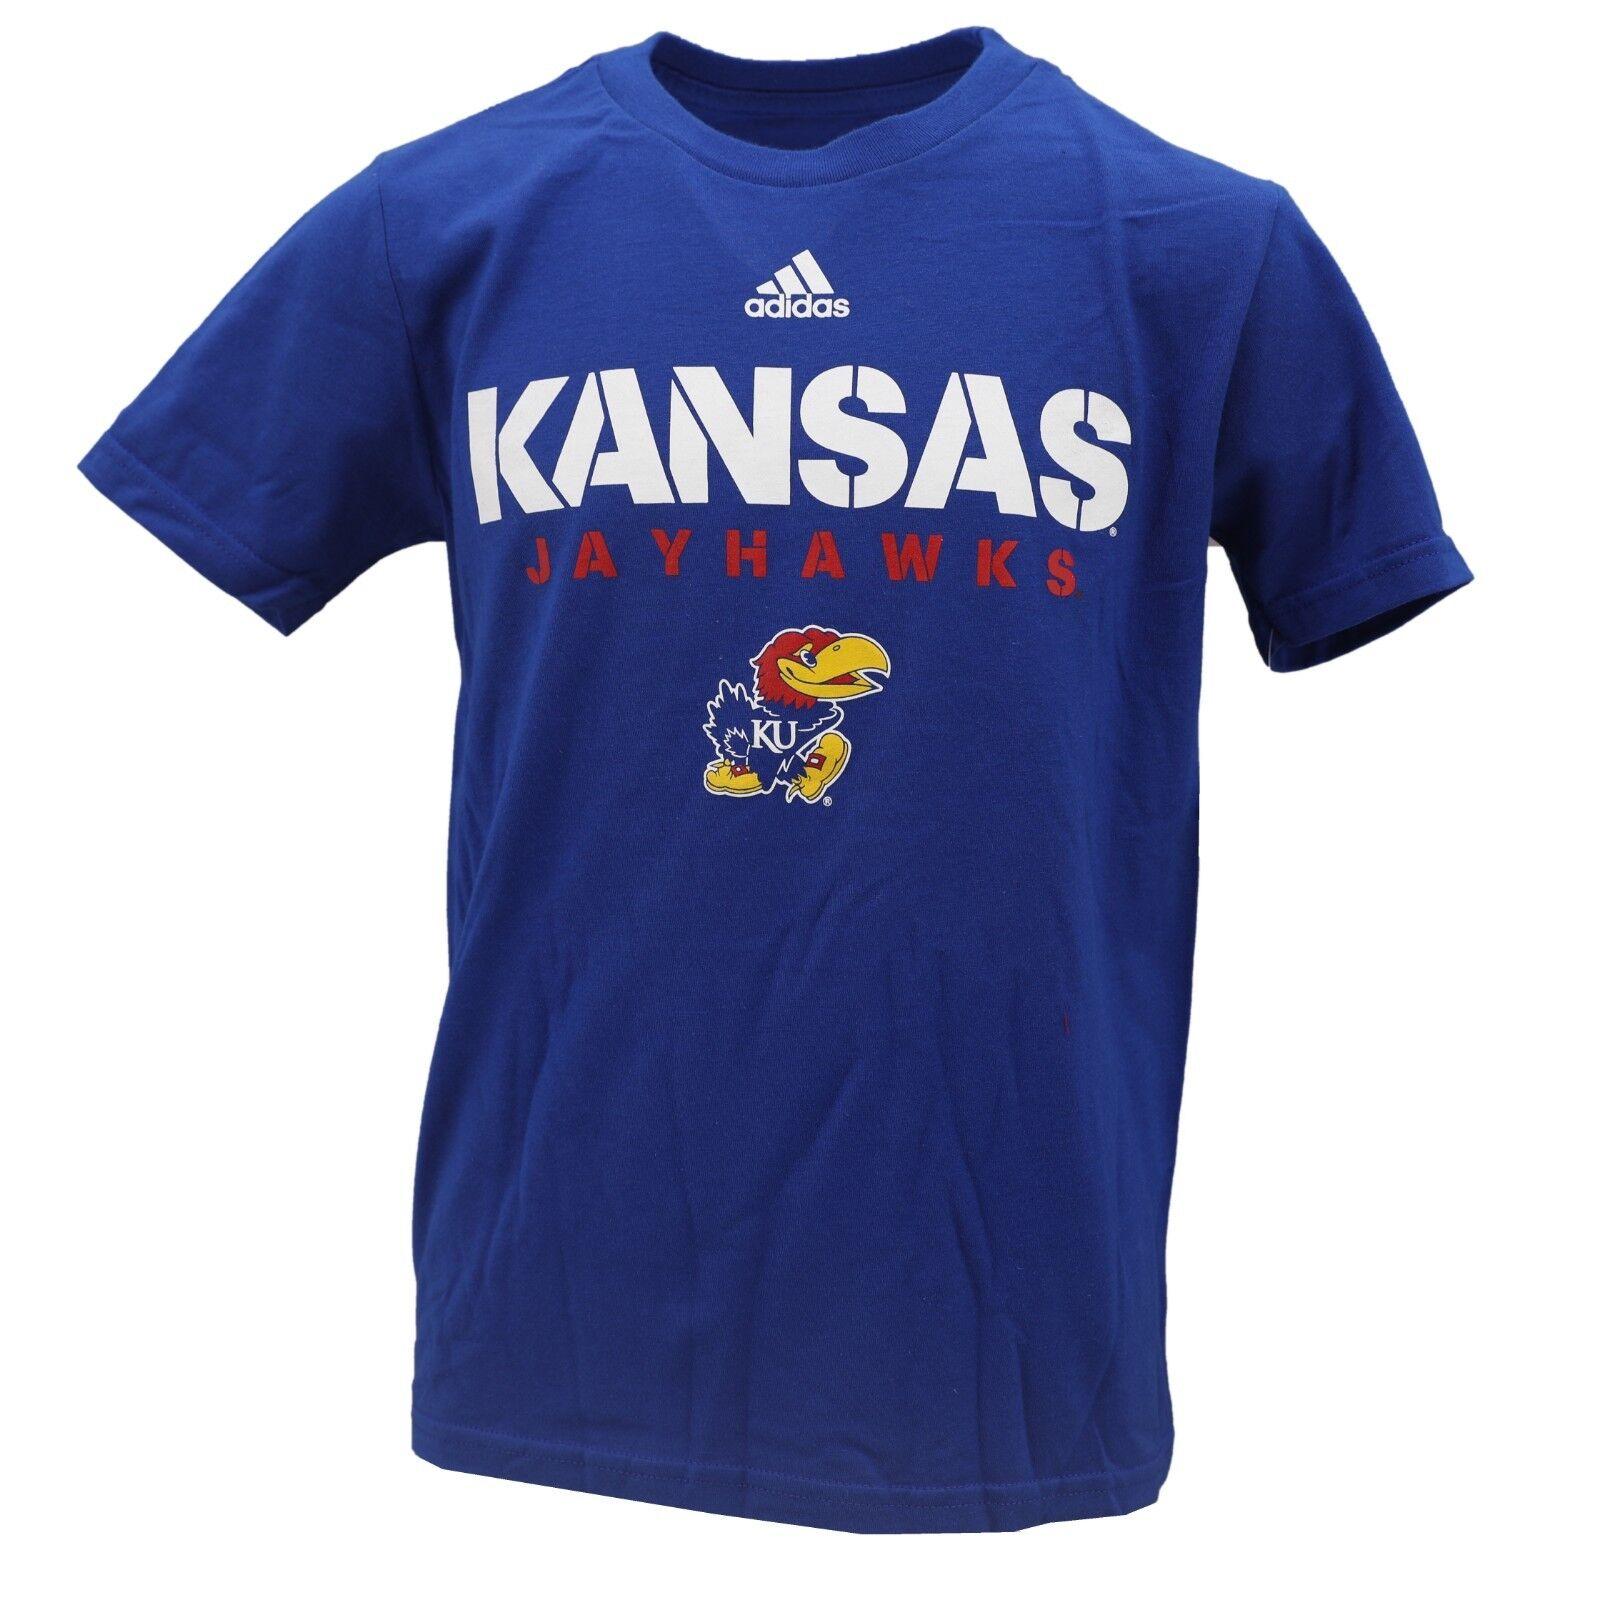 4ae93d6f100b Kansas Jayhawks Official NCAA Adidas Apparel Kids Youth Size T-Shirt New  Tags